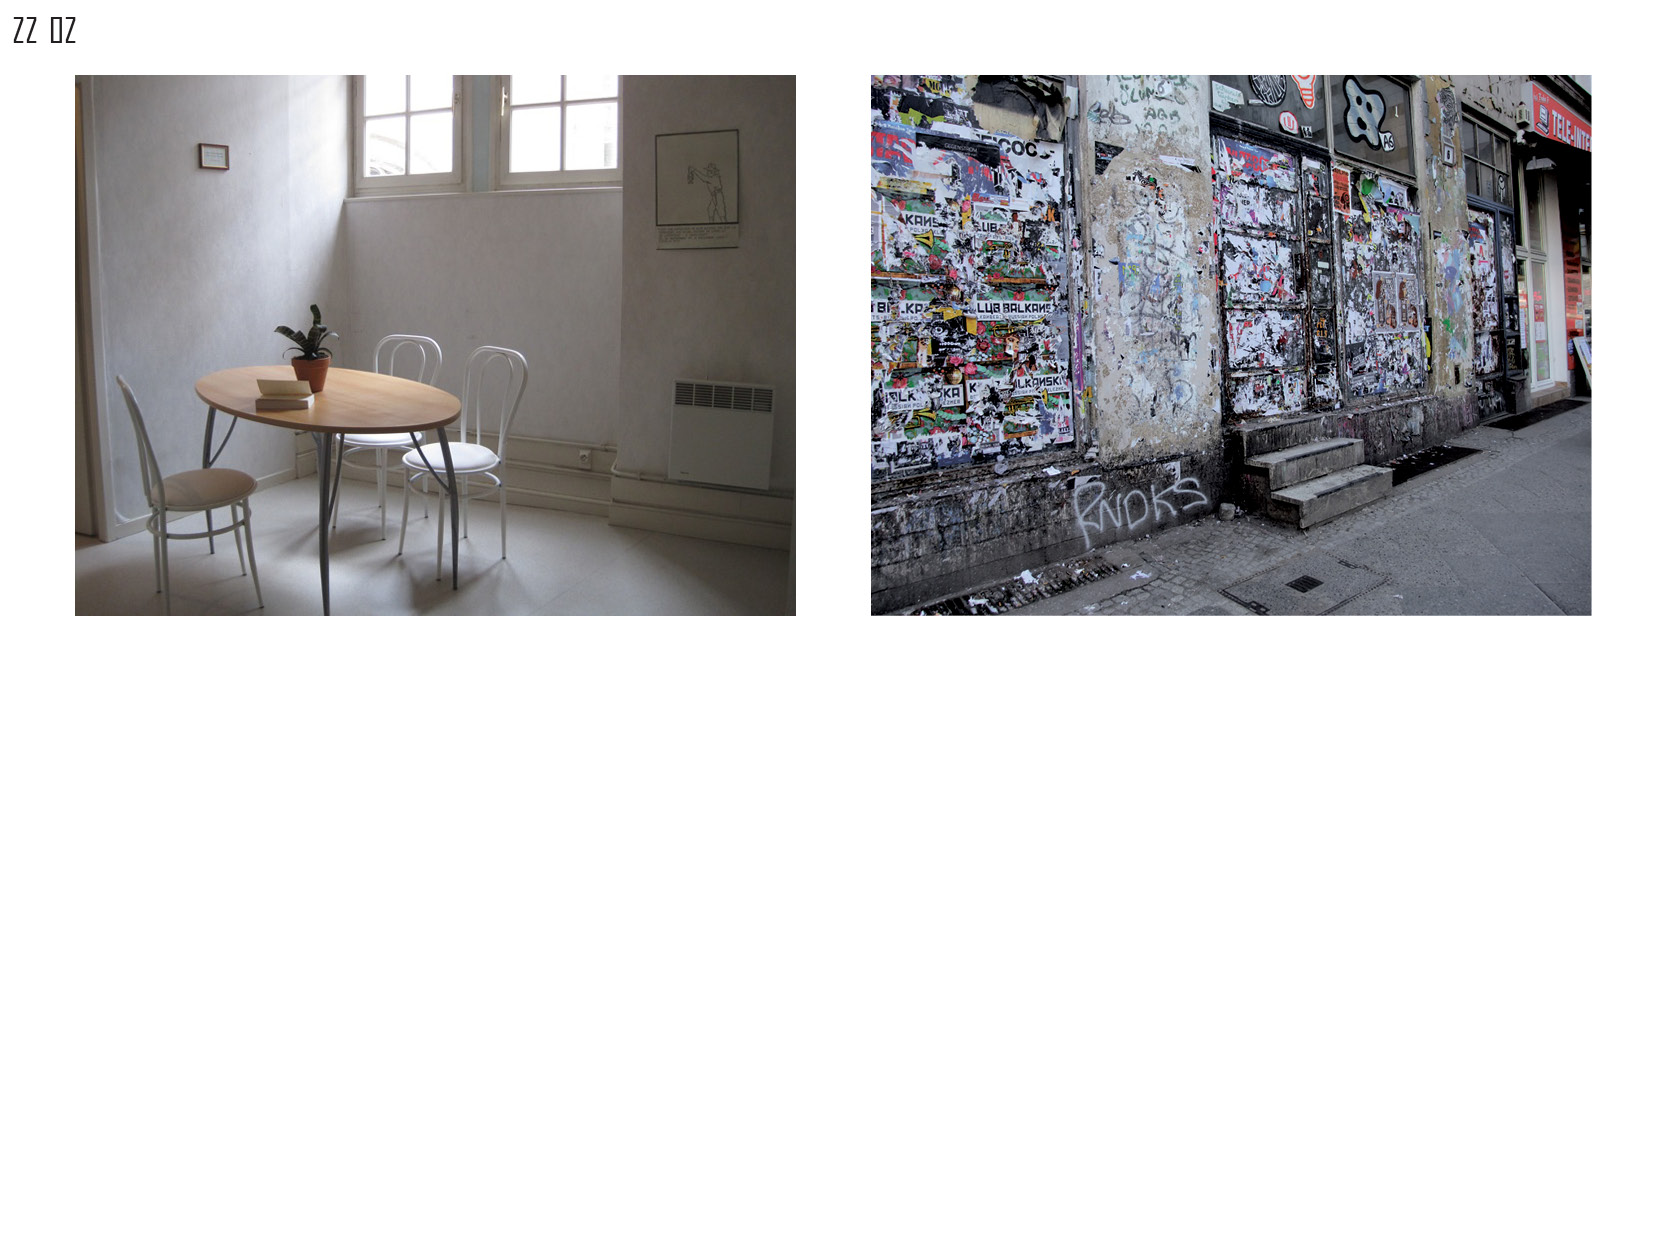 Gerrit-Schweiger-Dialog-Städte-Paris-Berlin-Jessica-Blank-Experiment-Fotoserie-Tagebuch-visuelle-Kommunikation-110